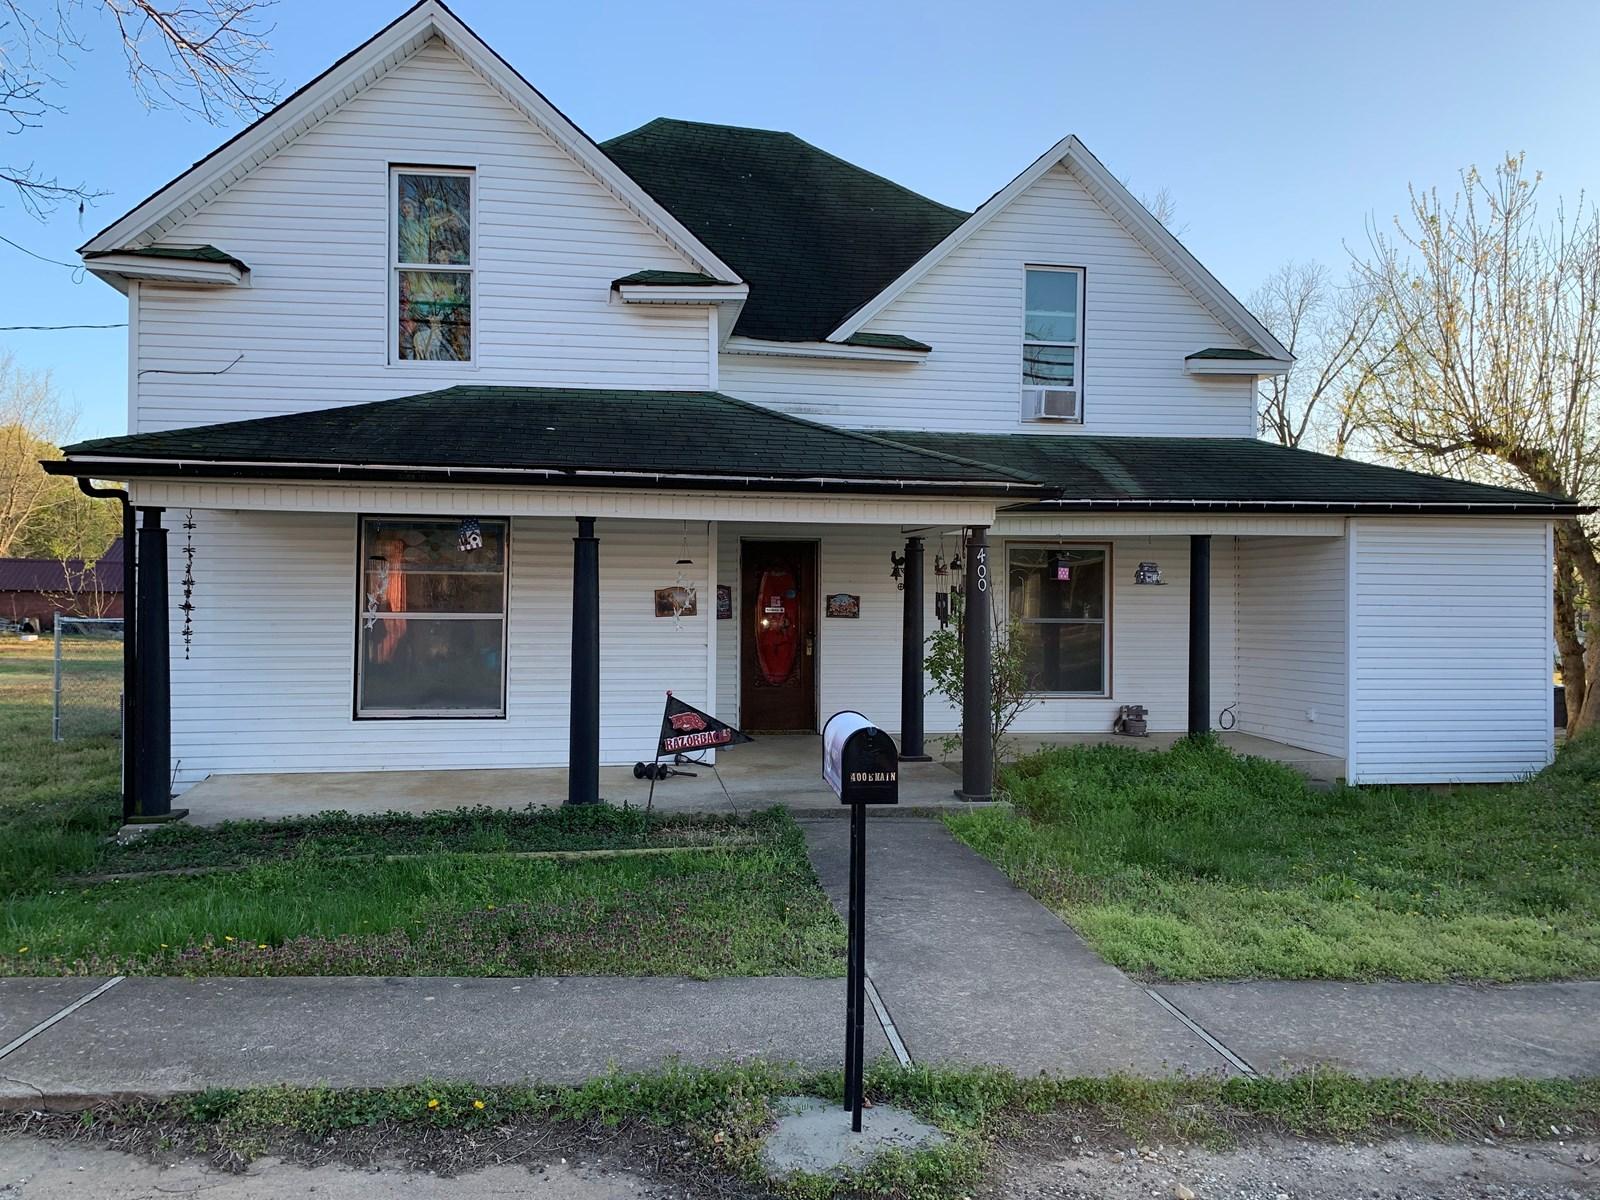 Historic Home For Sale in Marshall, Arkansas